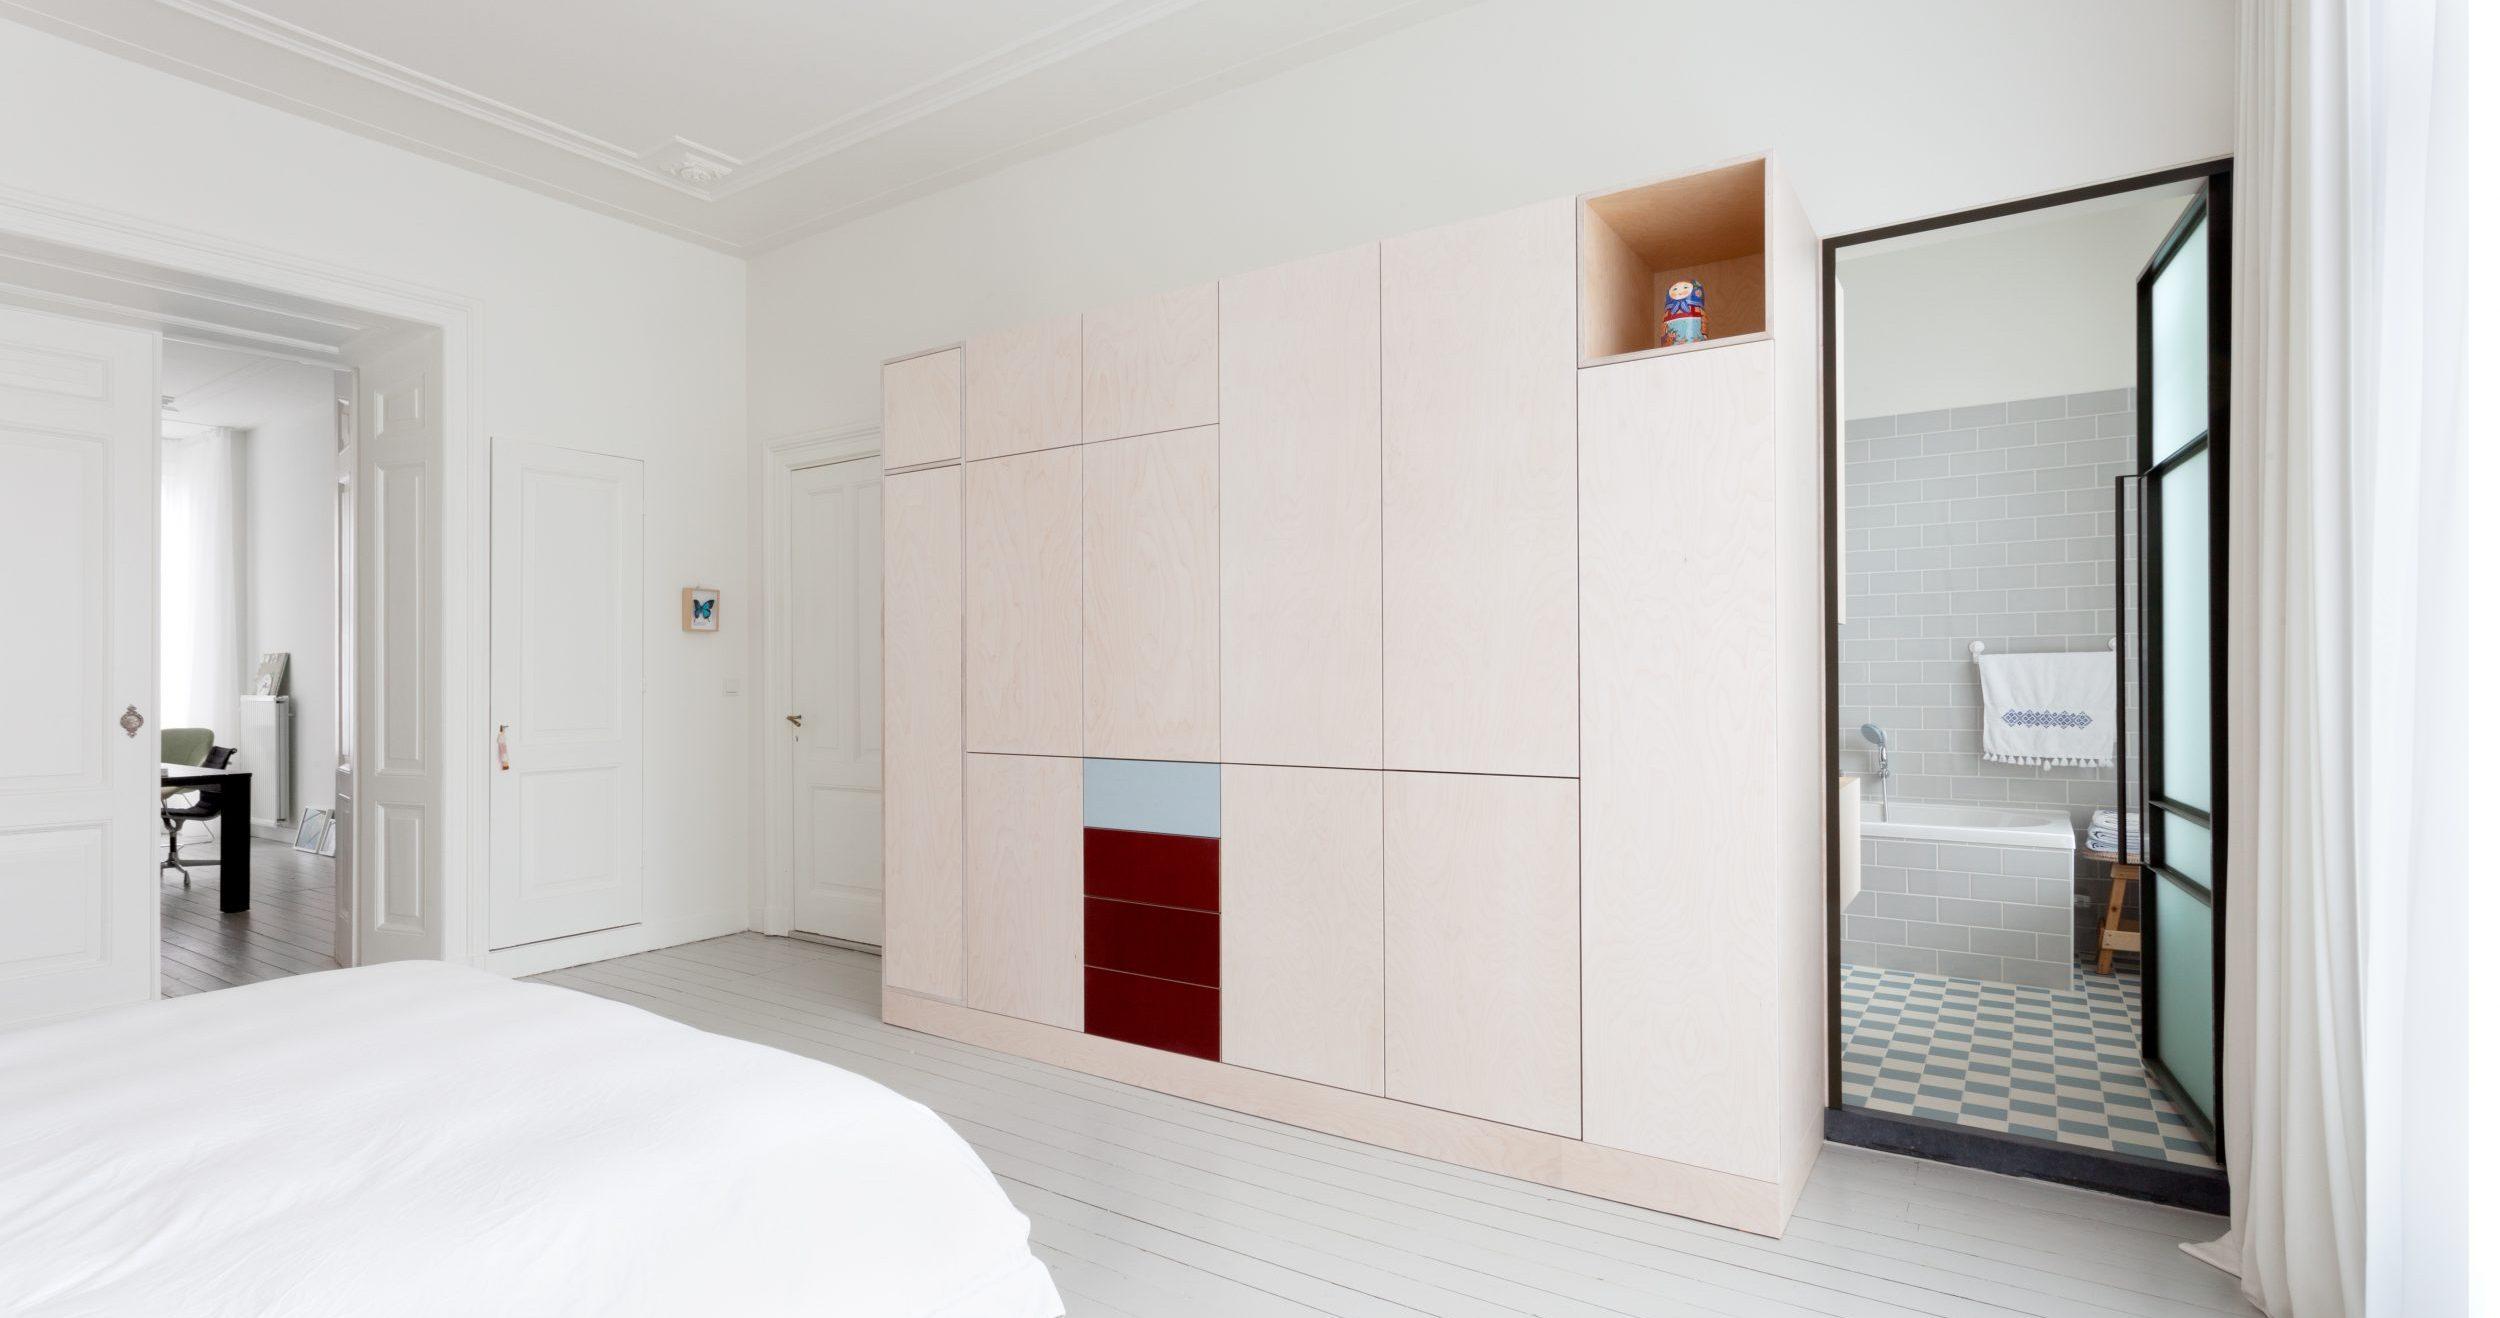 wandkast badkamer slaapkamer